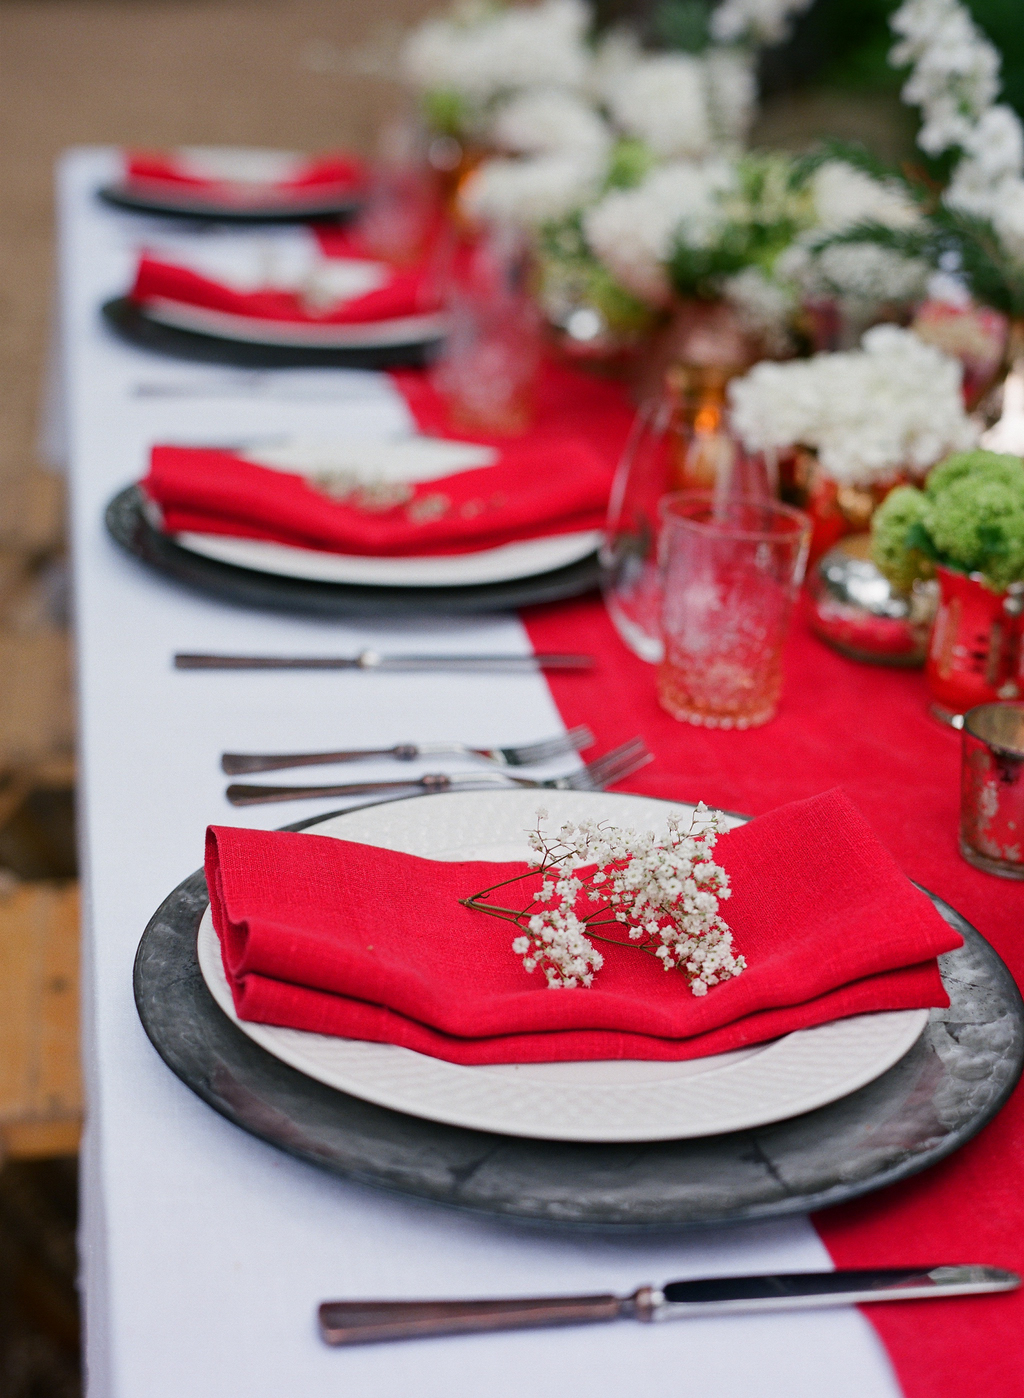 Styled-wedding-santa-barbara-chic-beaux-arts-photographie-italian-bohemian-wedding-venue-table-setting-red-white-flowers-antique-glass-098.full